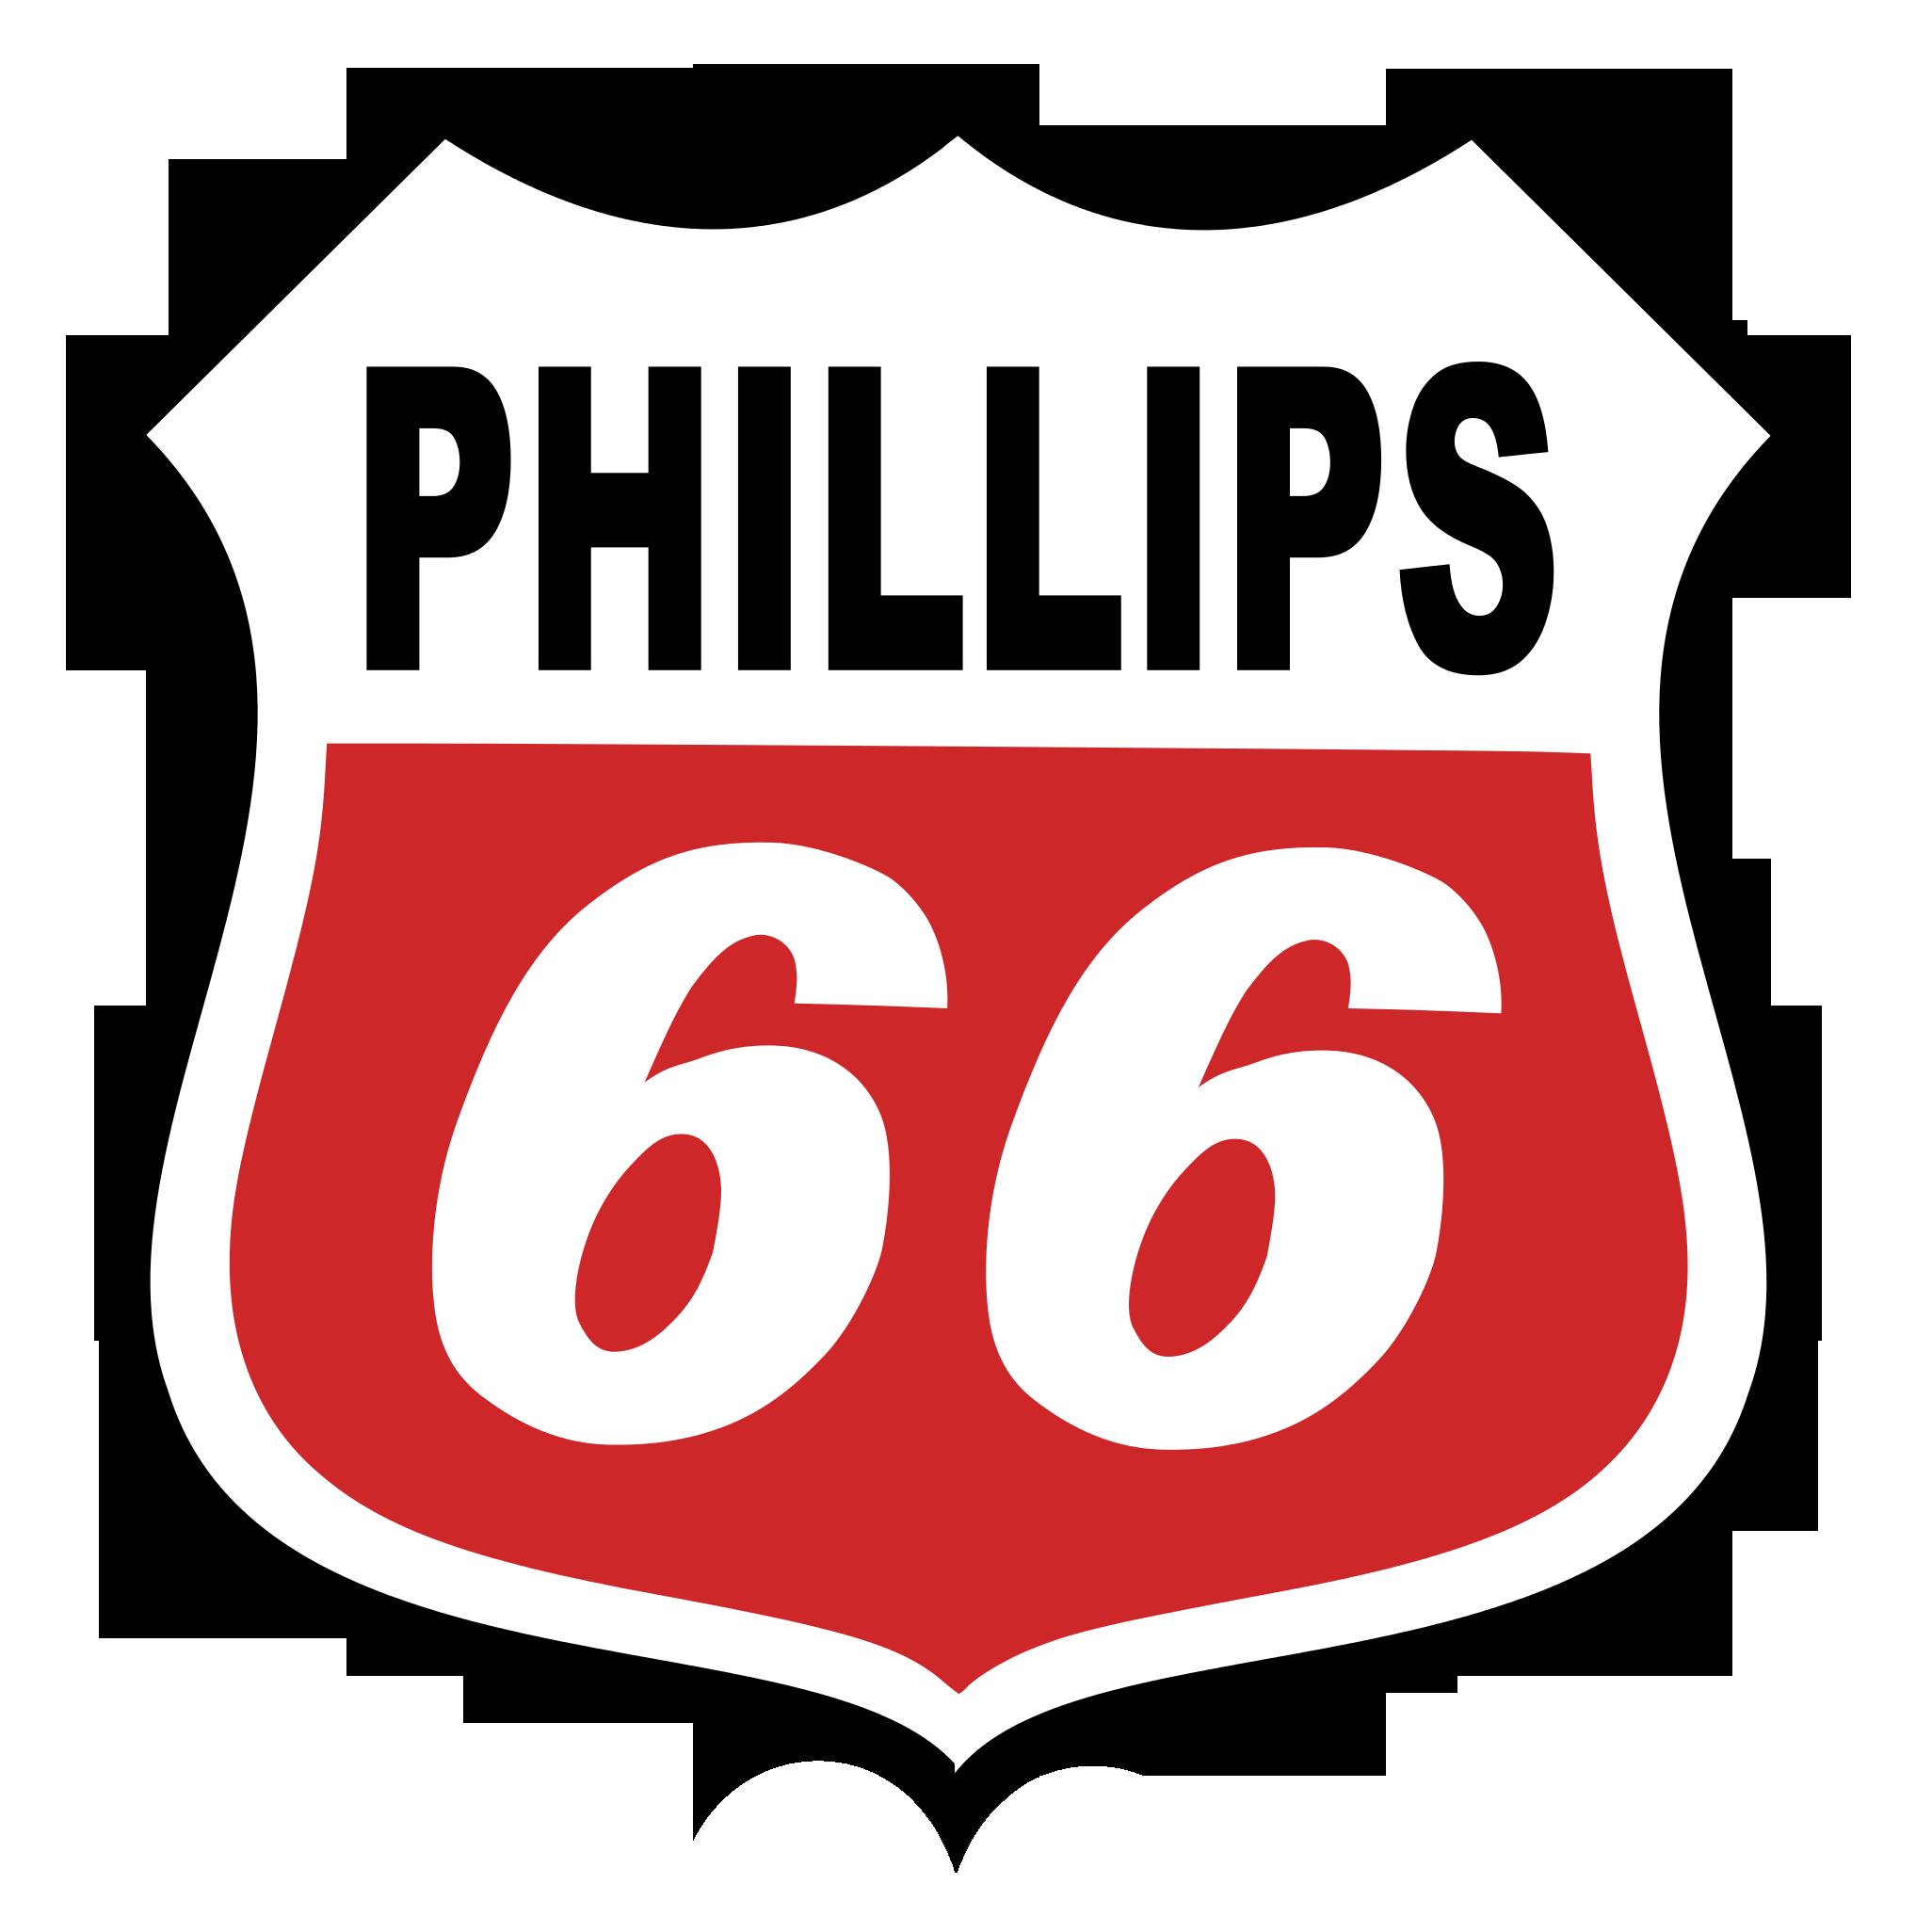 phillips 66 logo png image purepng free transparent